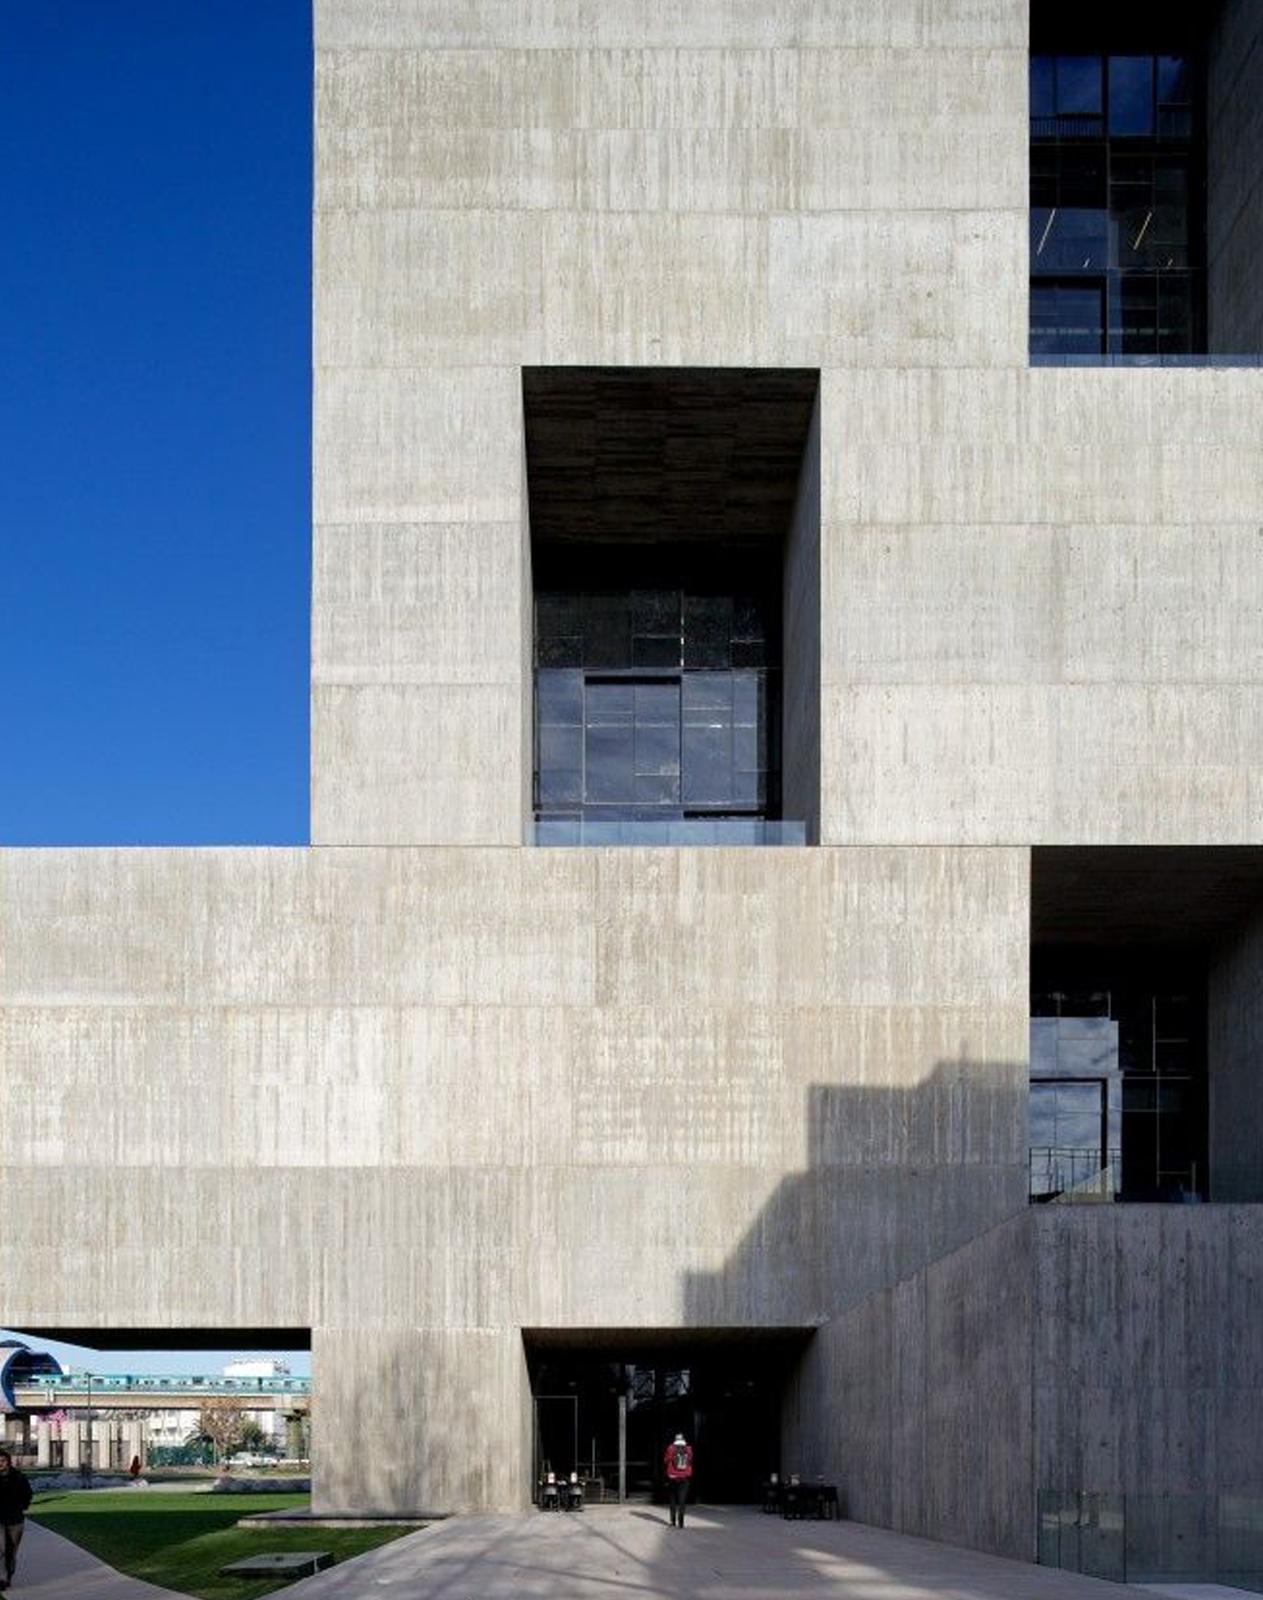 alejandro-aravena-premio-pritzke-arquitectura-2016-5